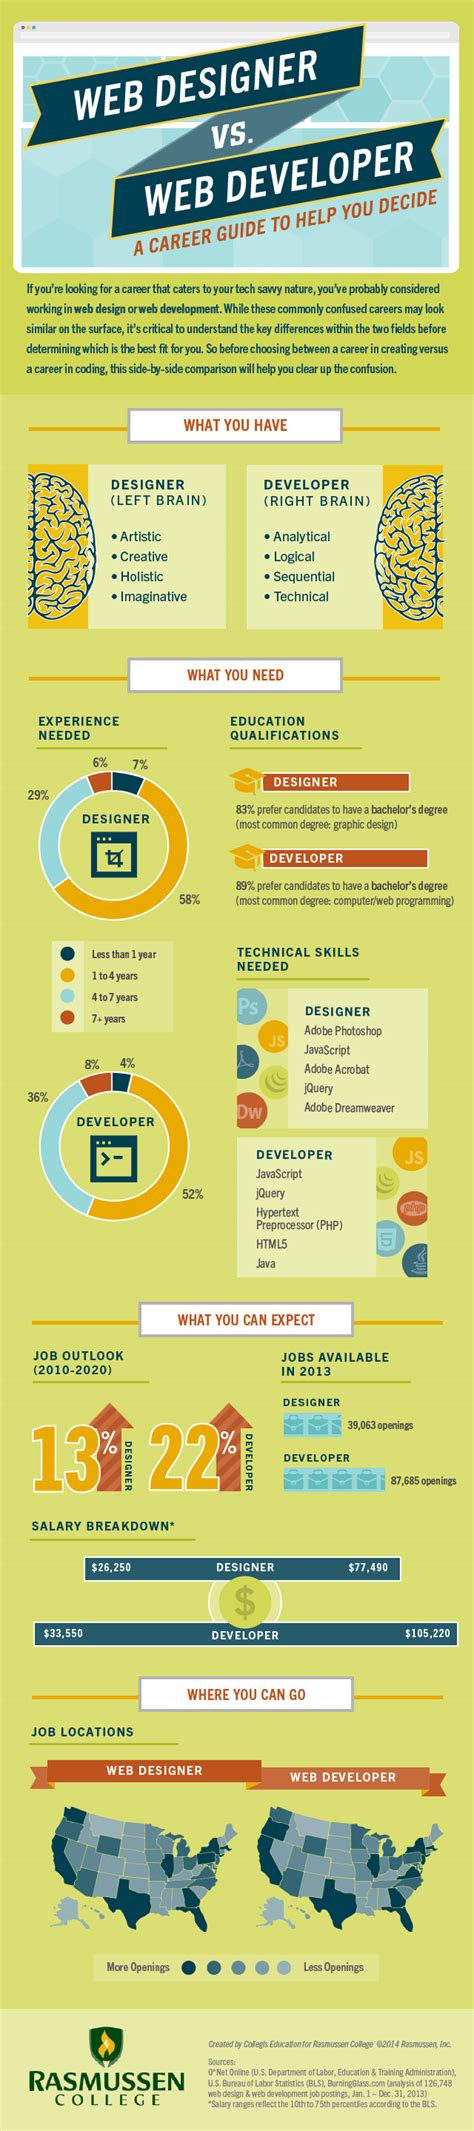 website design help web designer vs web developer a career guide to help you